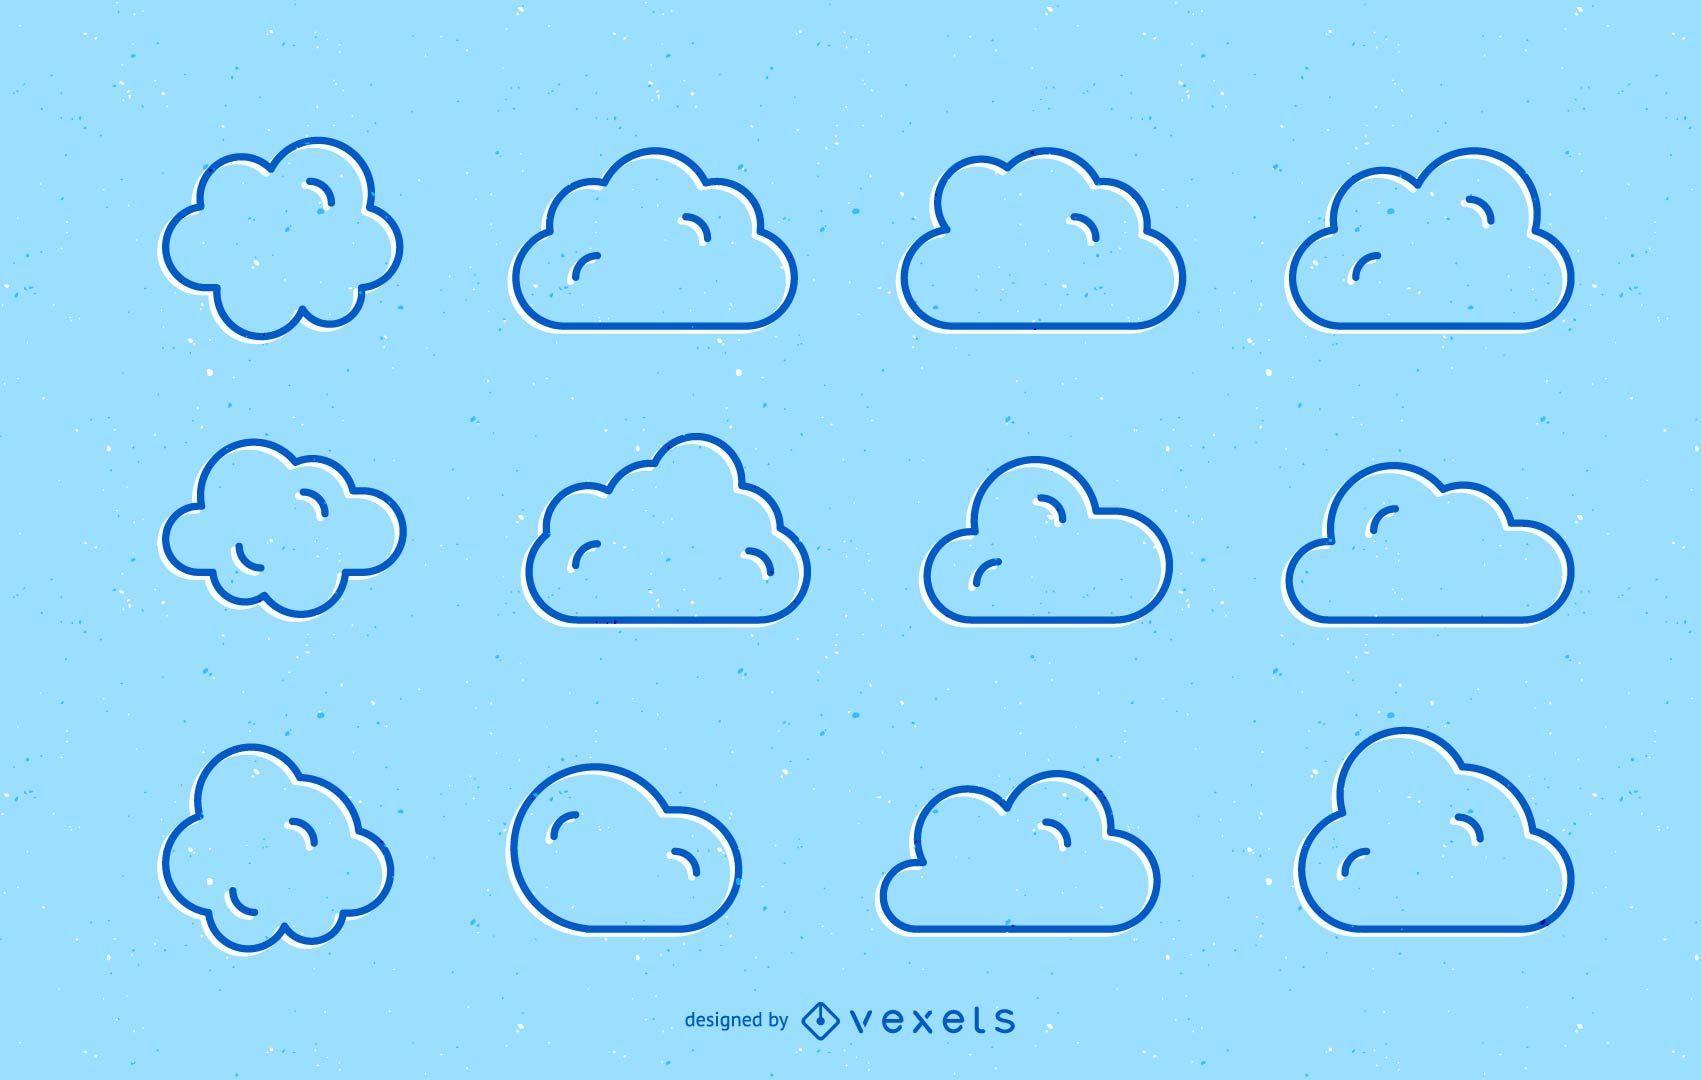 Clouds stroke set